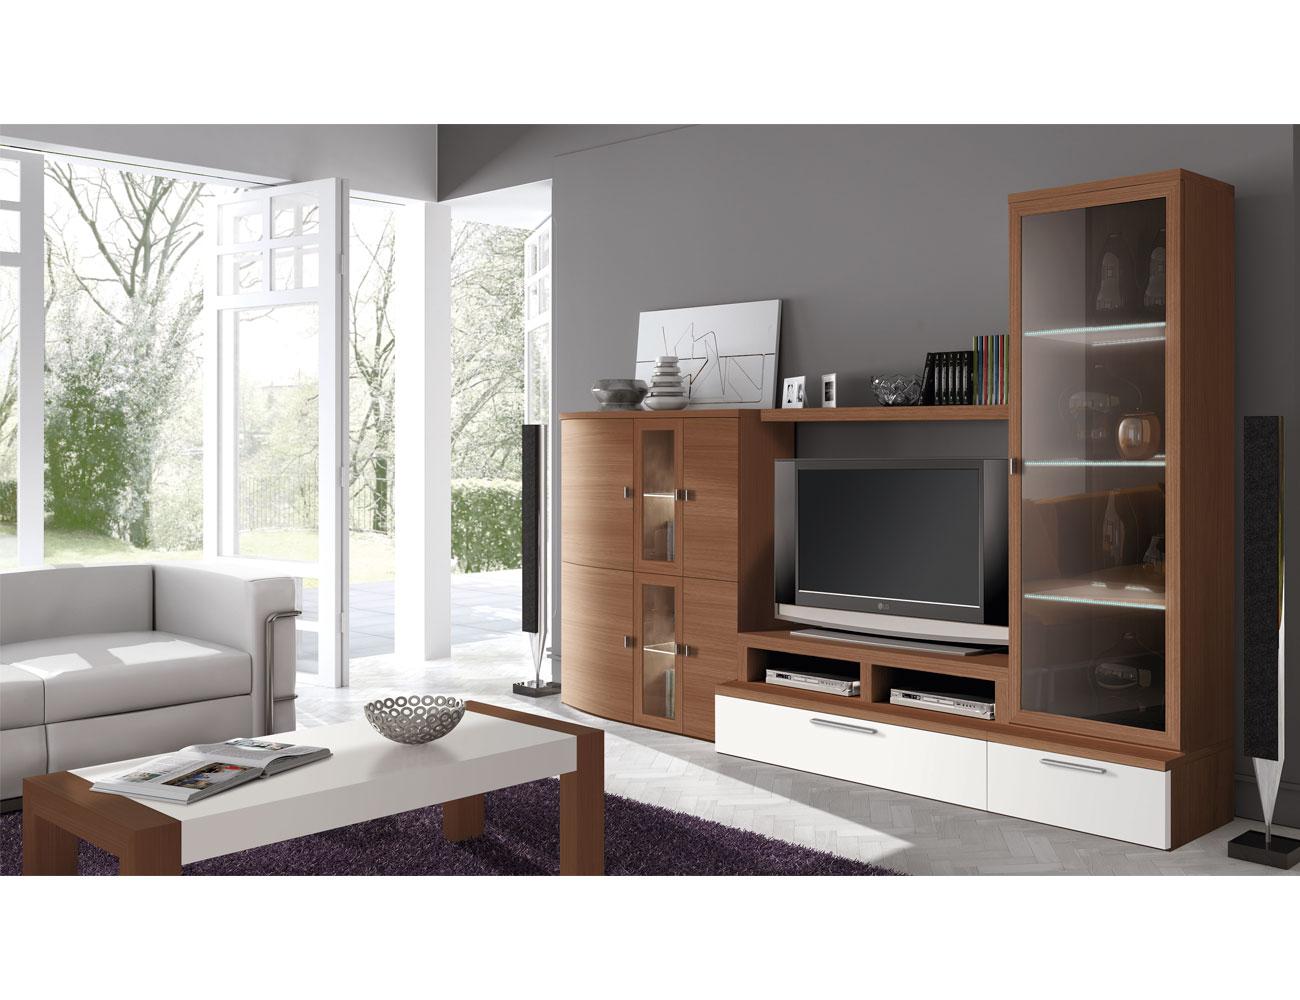 716 mueble salon comedor paisaje